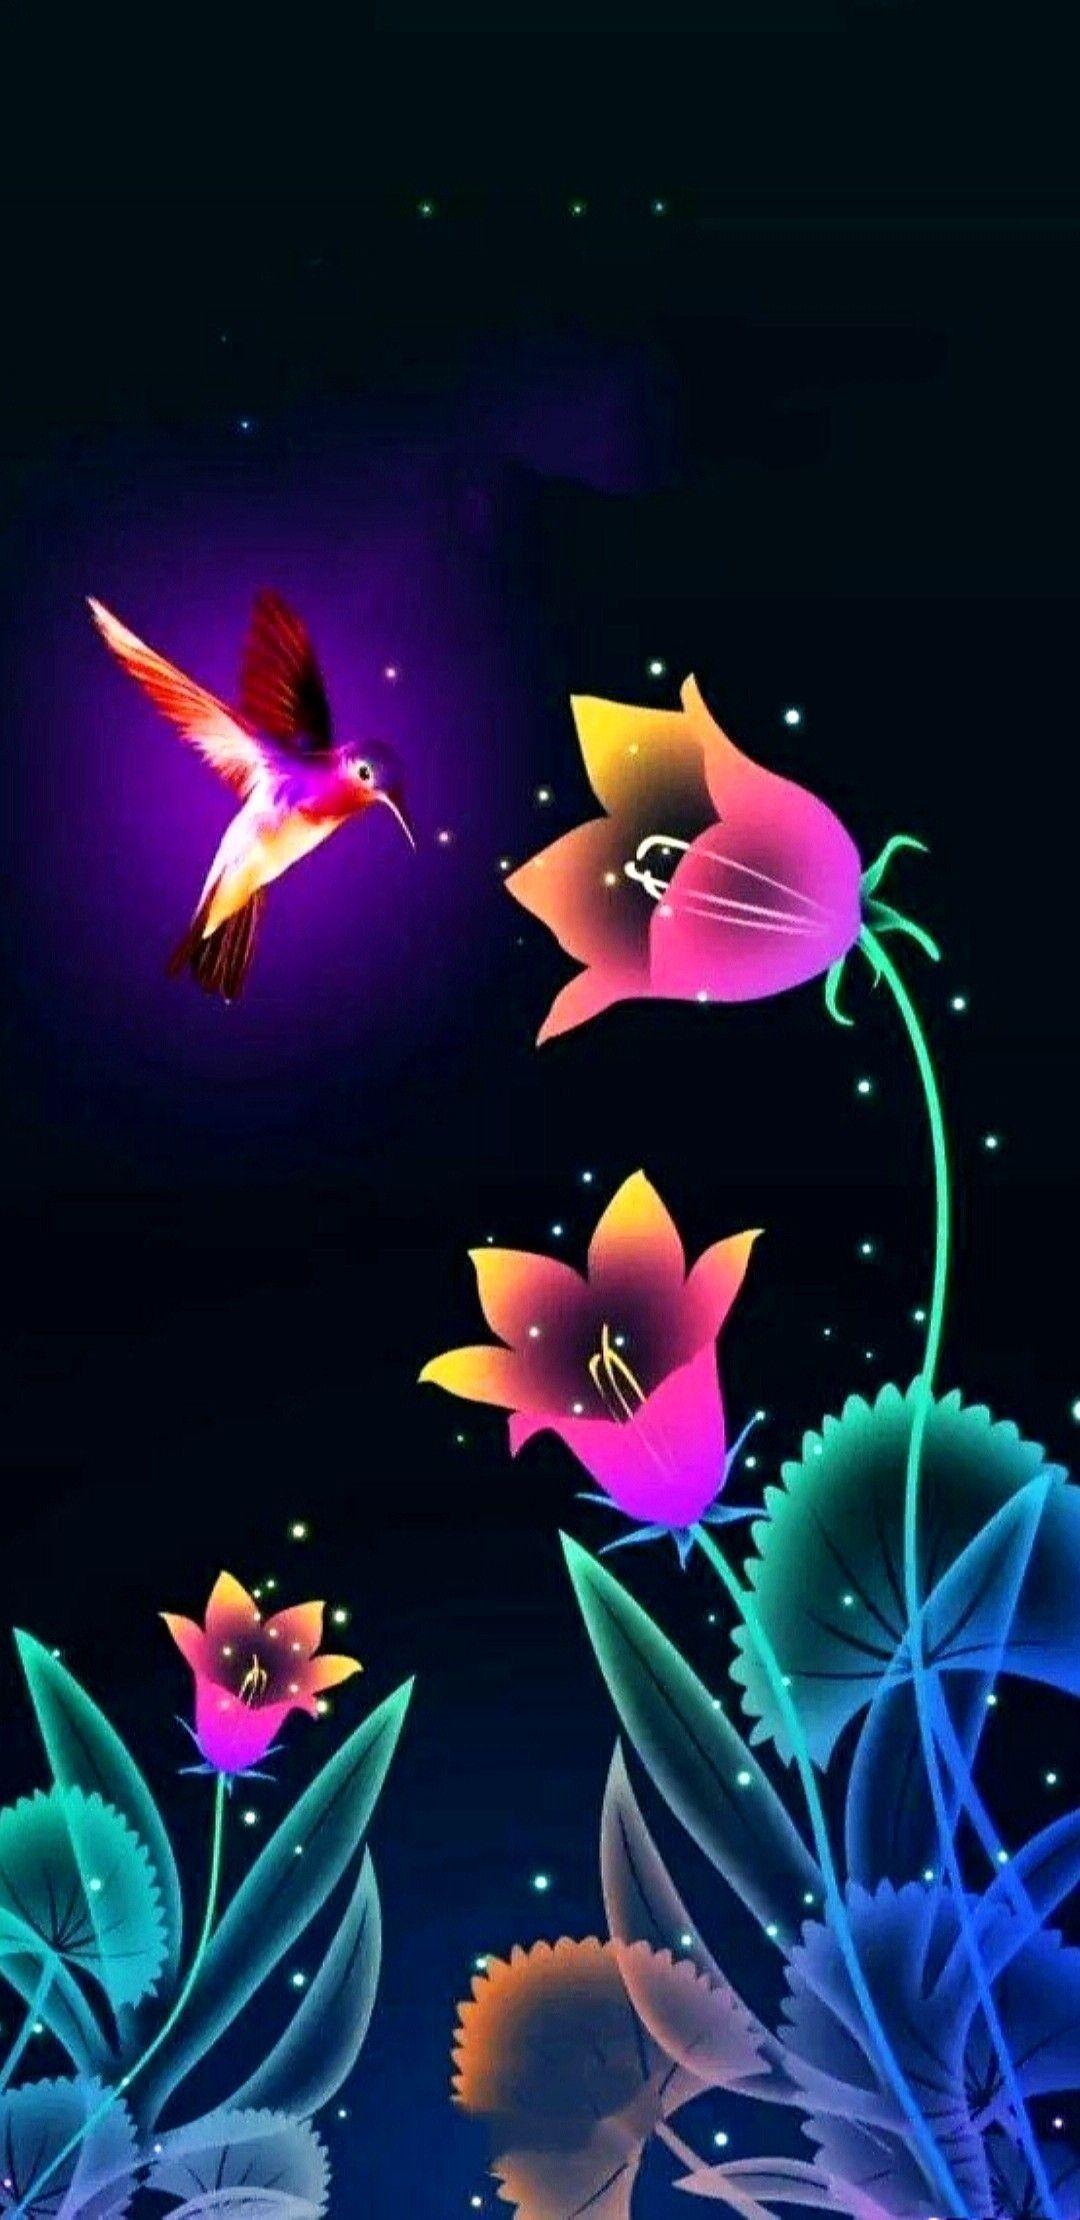 Pin By K Ru N On Pegasus Unicorn Flower Phone Wallpaper Colorful Wallpaper Hummingbird Wallpaper